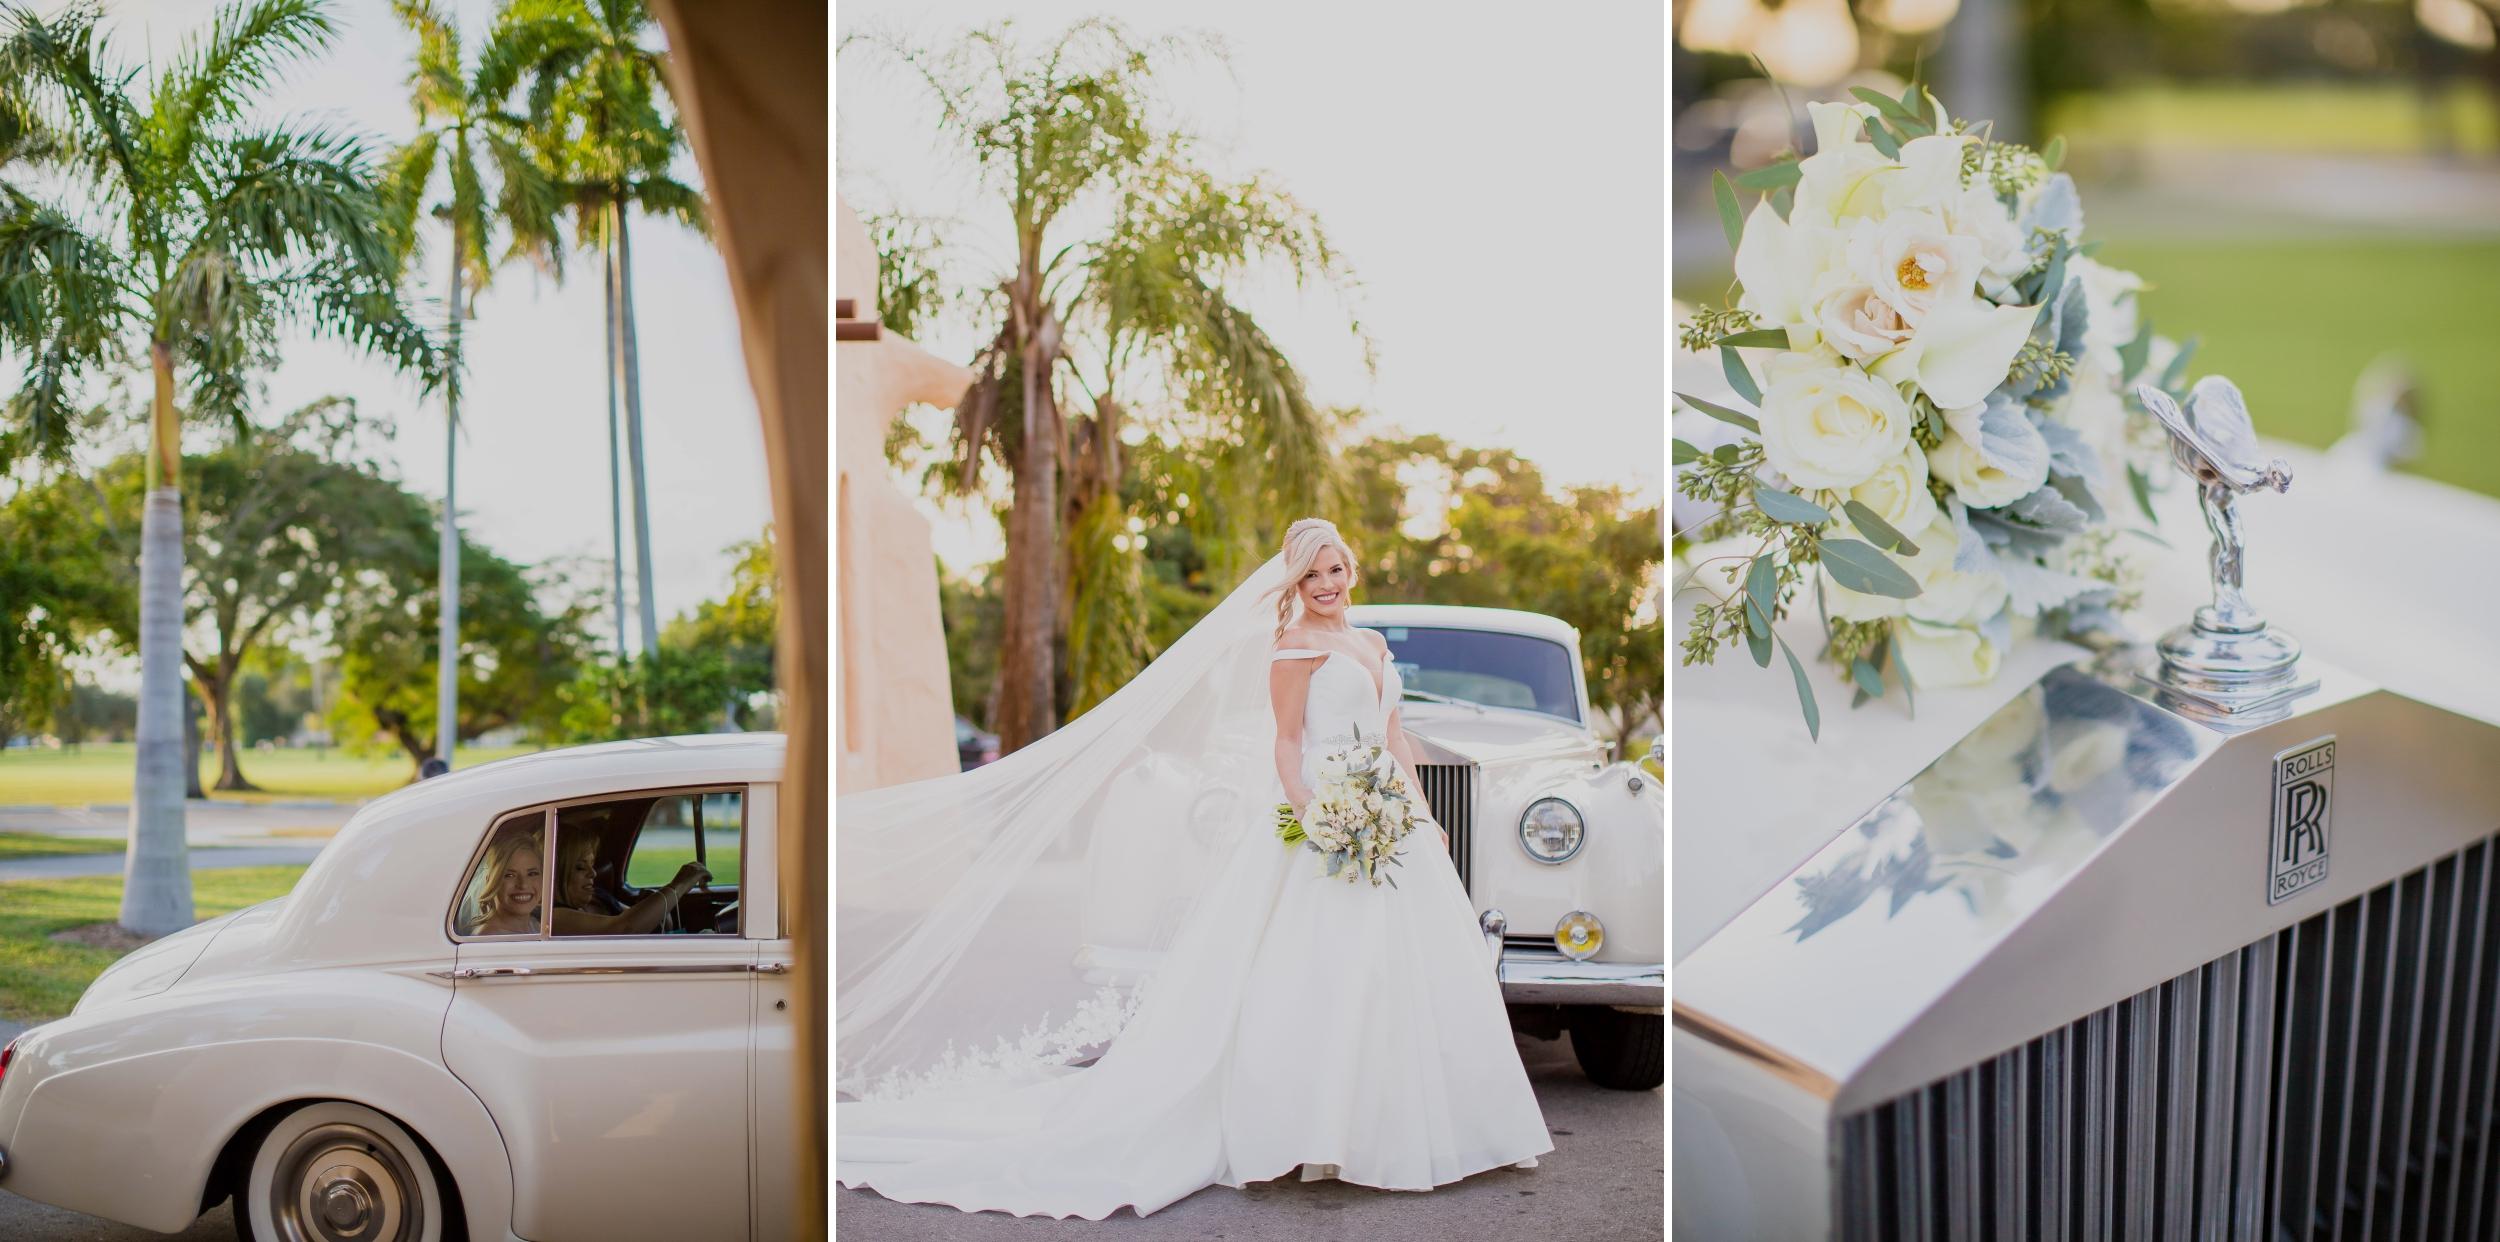 Santy Martinez - Curtiss Masion Wedding 3.jpg